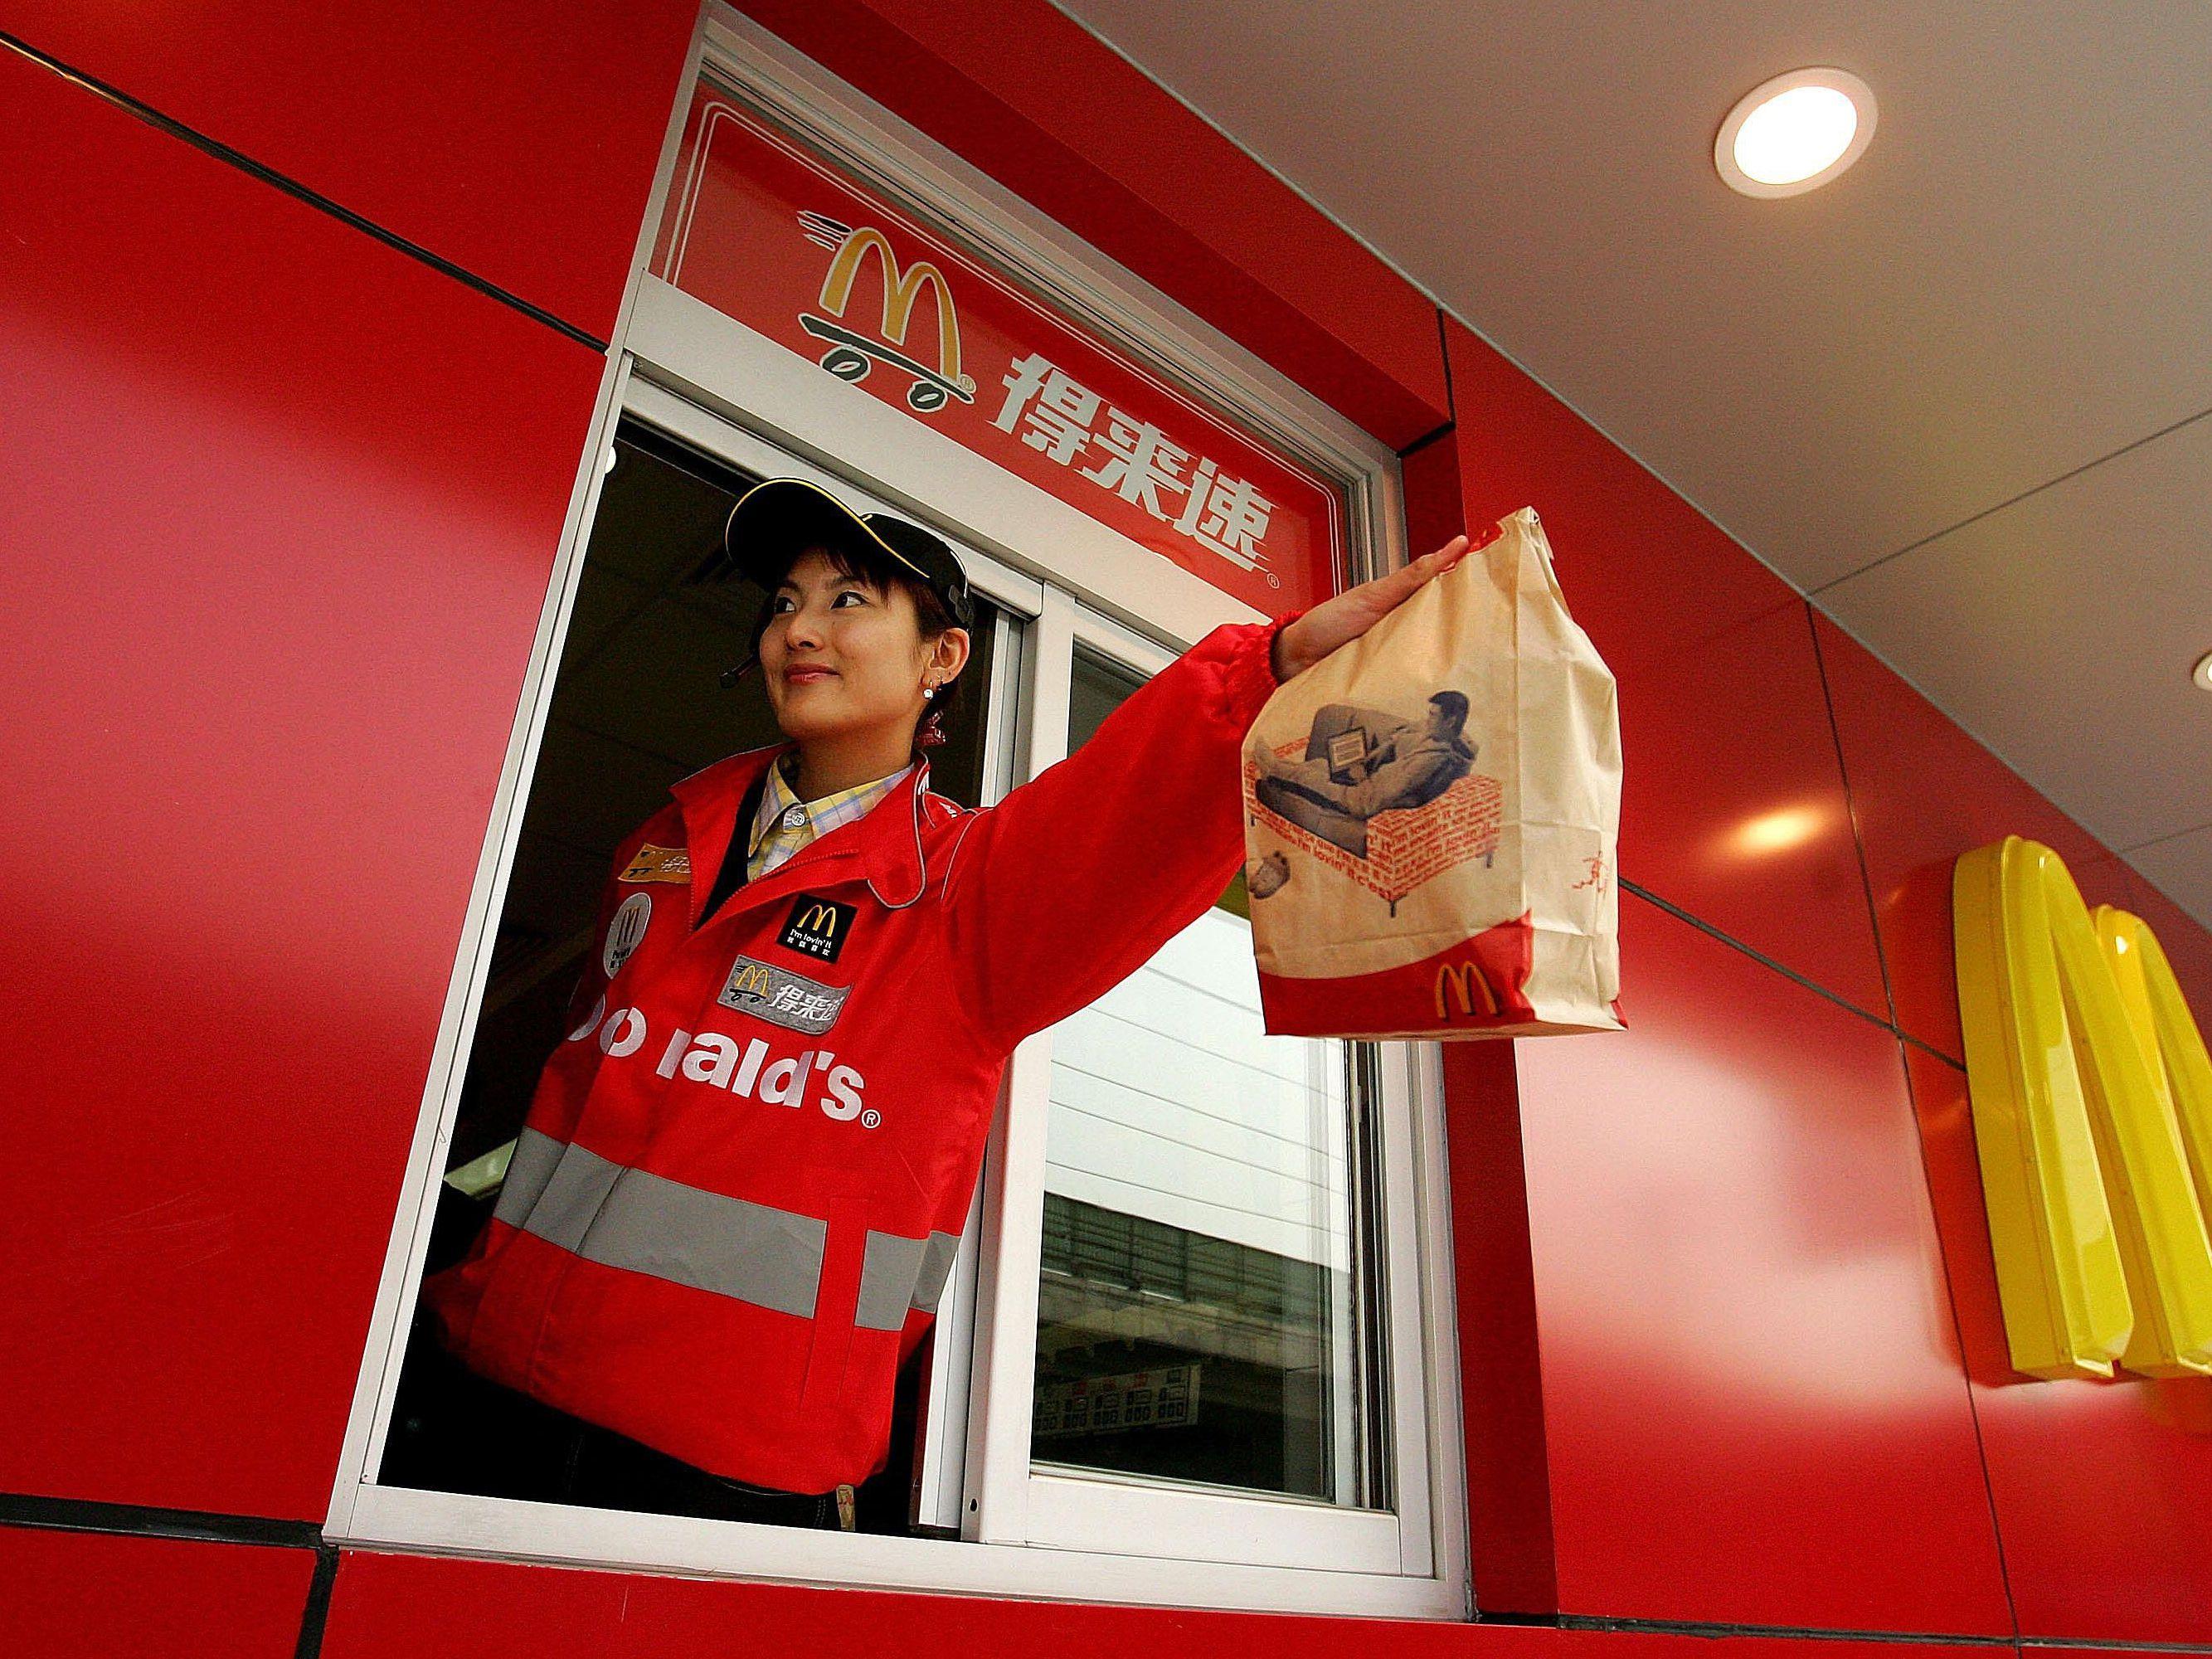 Understanding the Phenomenon of McDonaldization